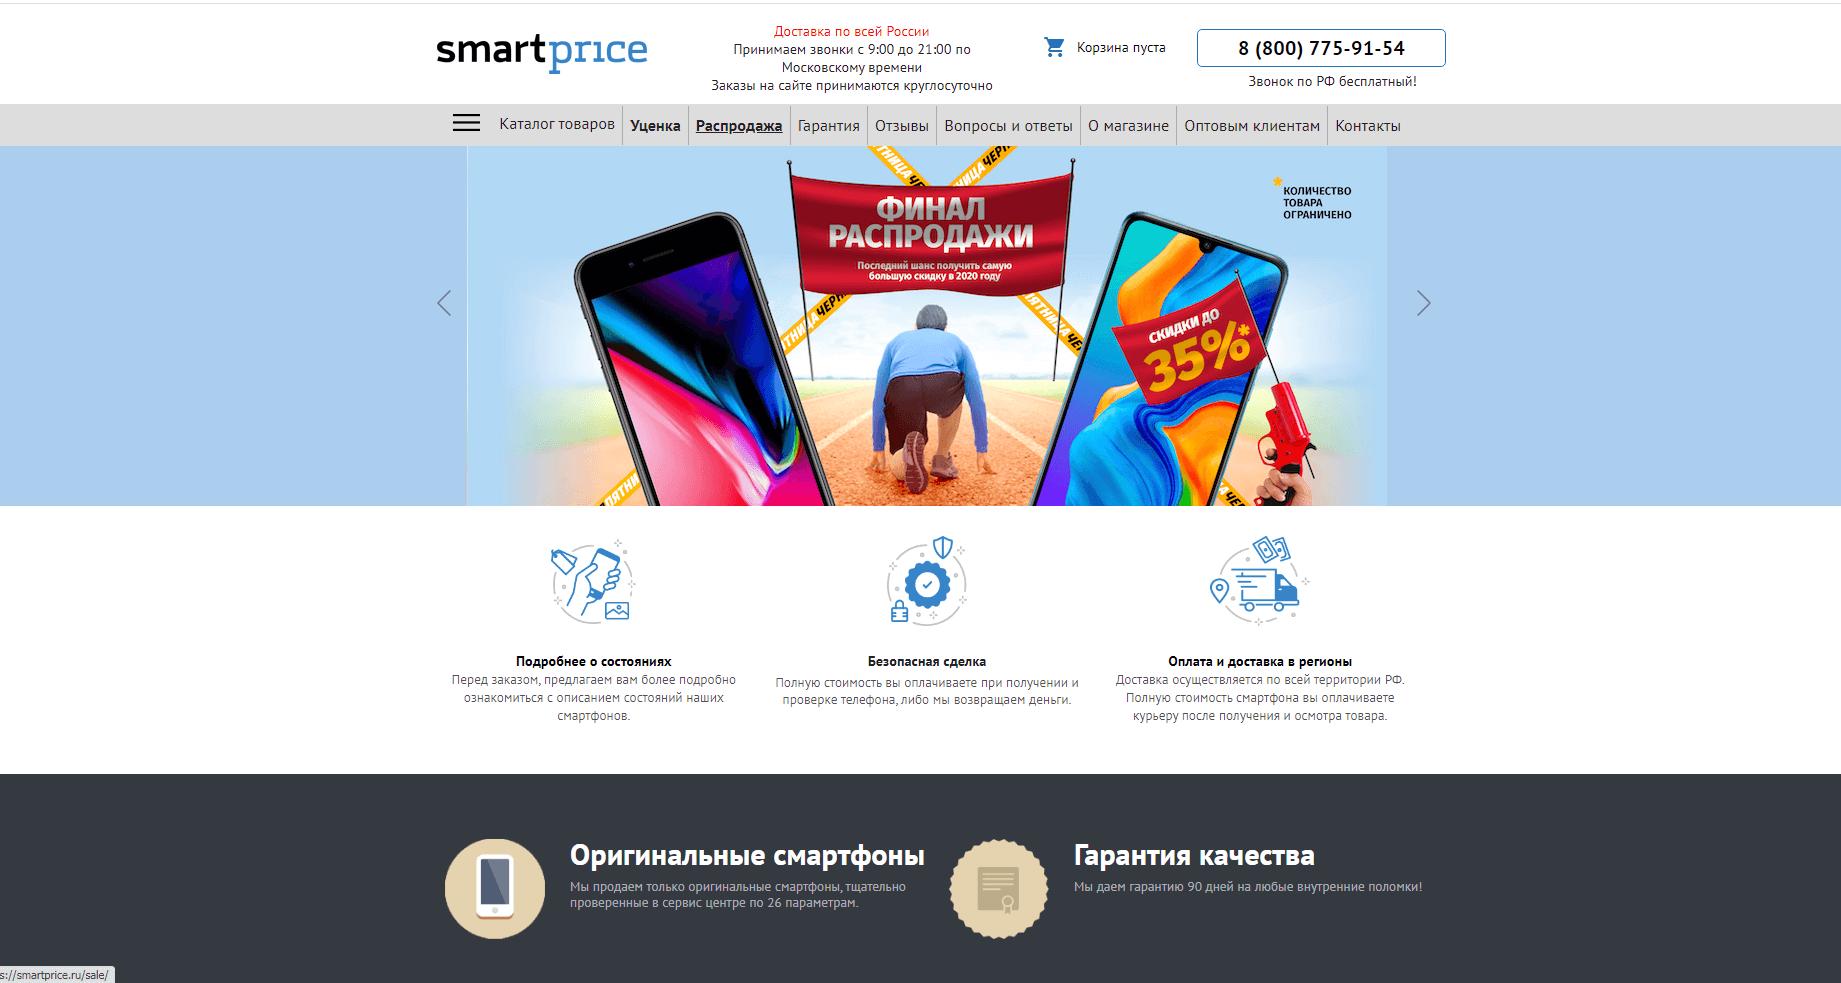 smartprice.ru website